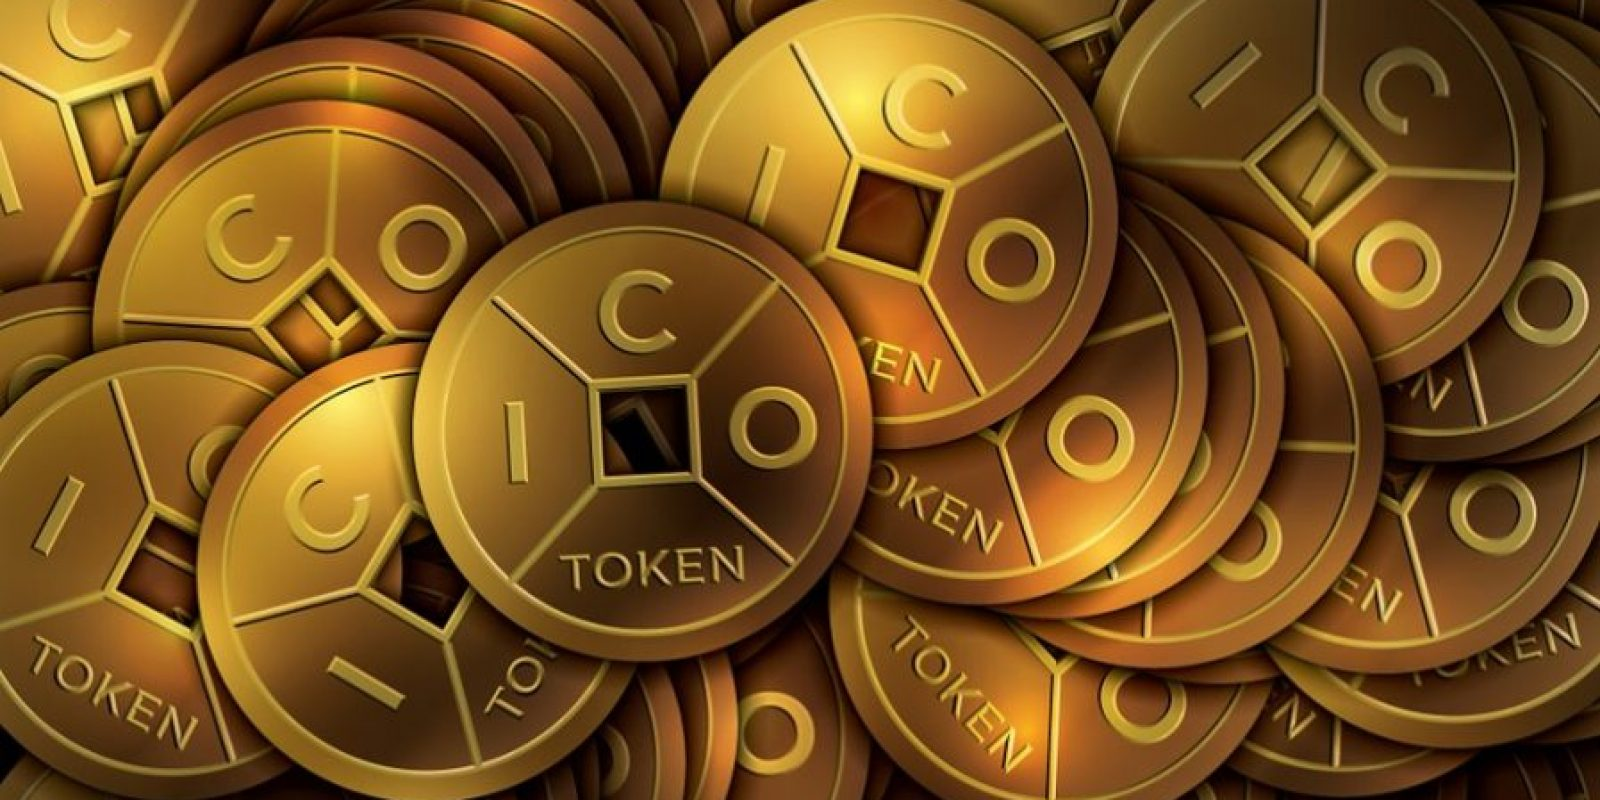 ico-tokens